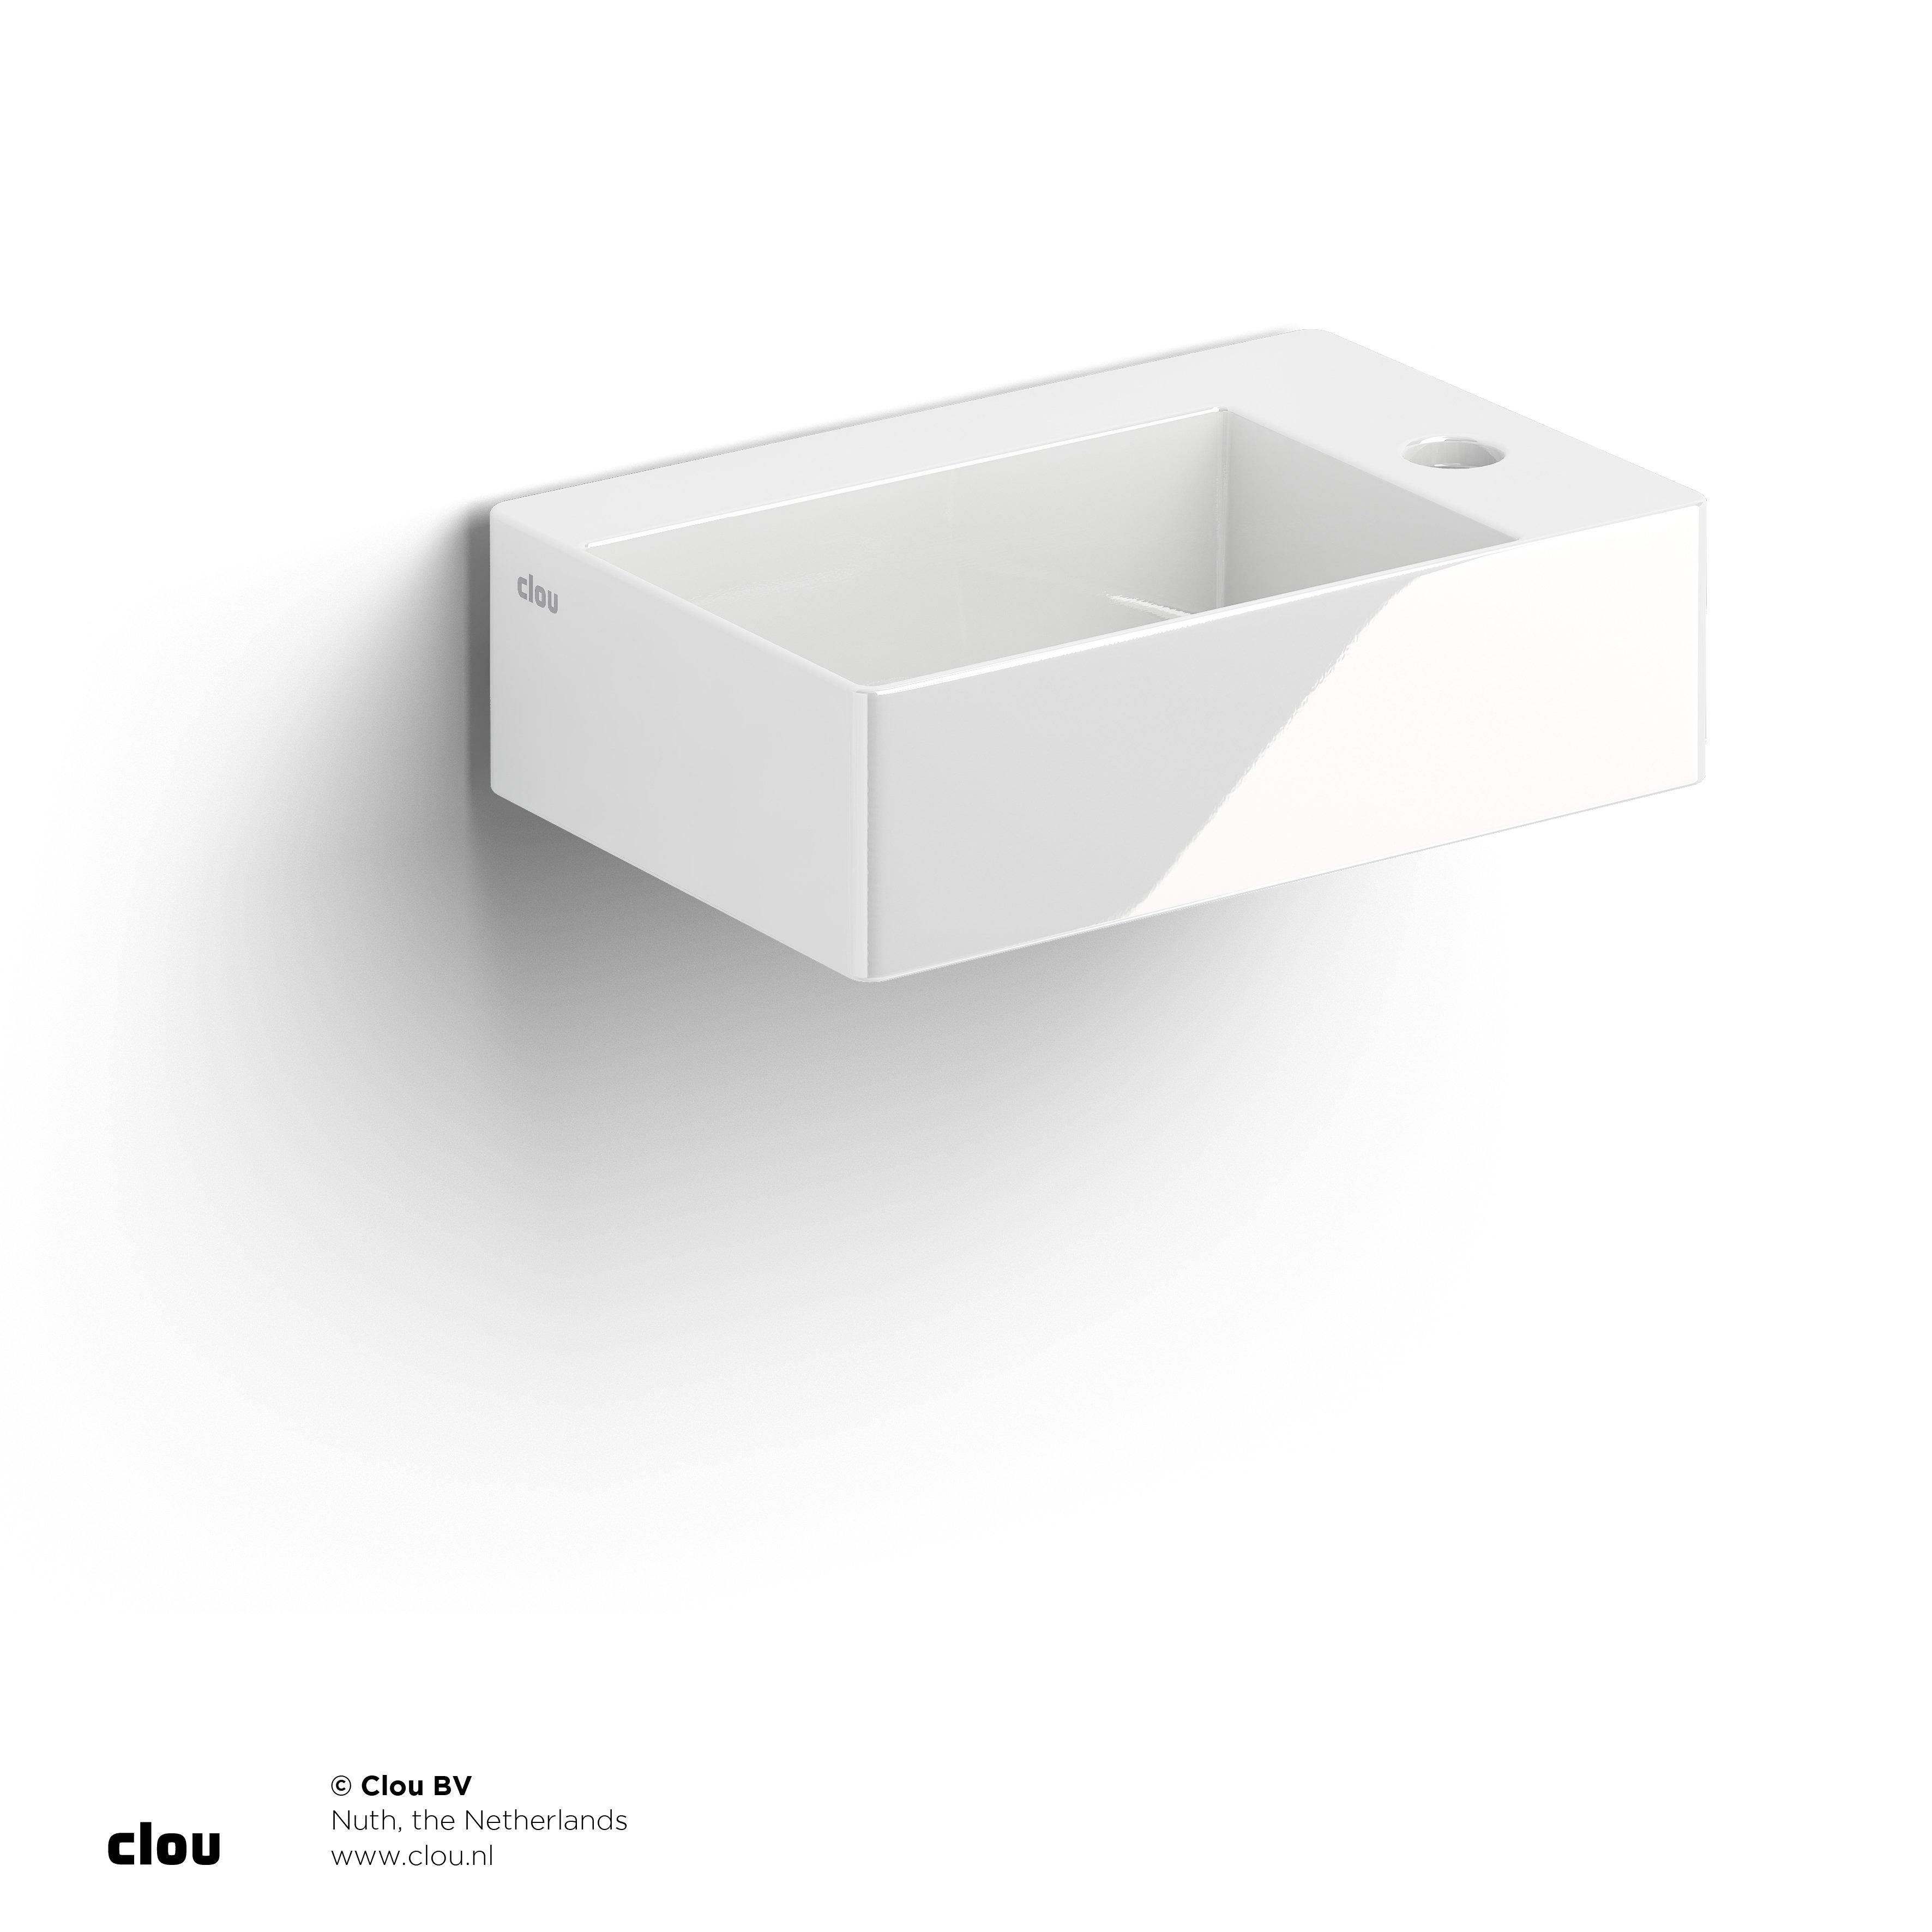 Productafbeelding van Clou New Flush 2 fontein incl. plug met kraangat wit keramiek CL/03.03420.01